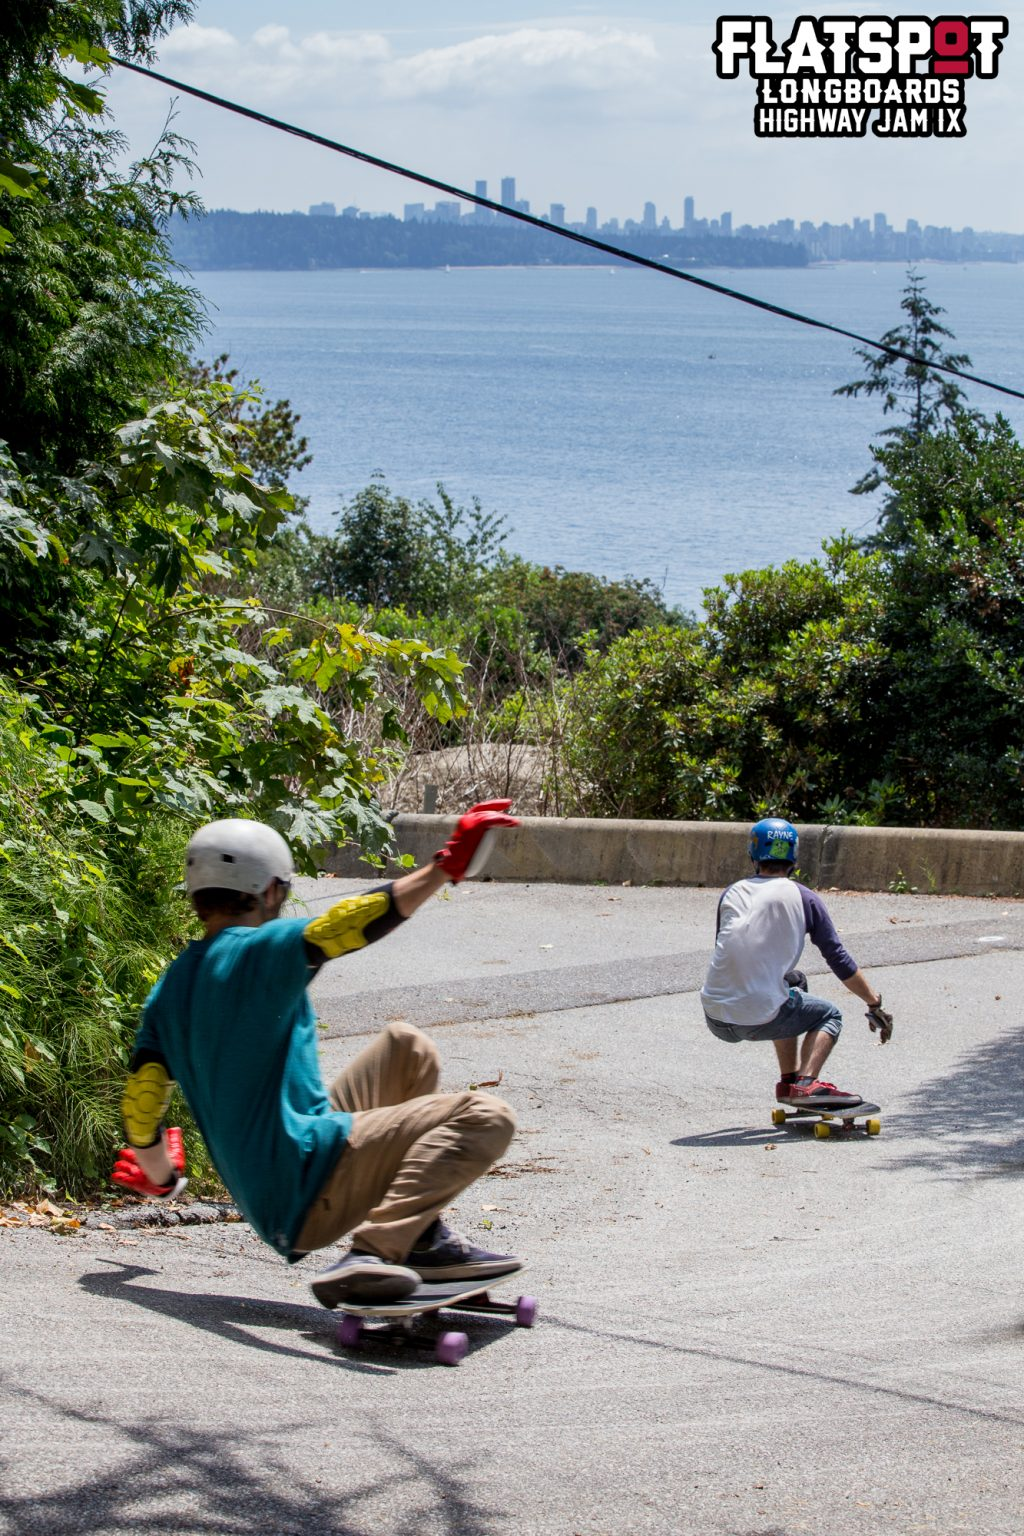 caliber-trucks-highway-jam-freeride-longboarding-flatspot-longboards-longboard-session-longboard-event-prism-skateboards-liam-morgan-james-kelly-jordan-riachi-cooper-7